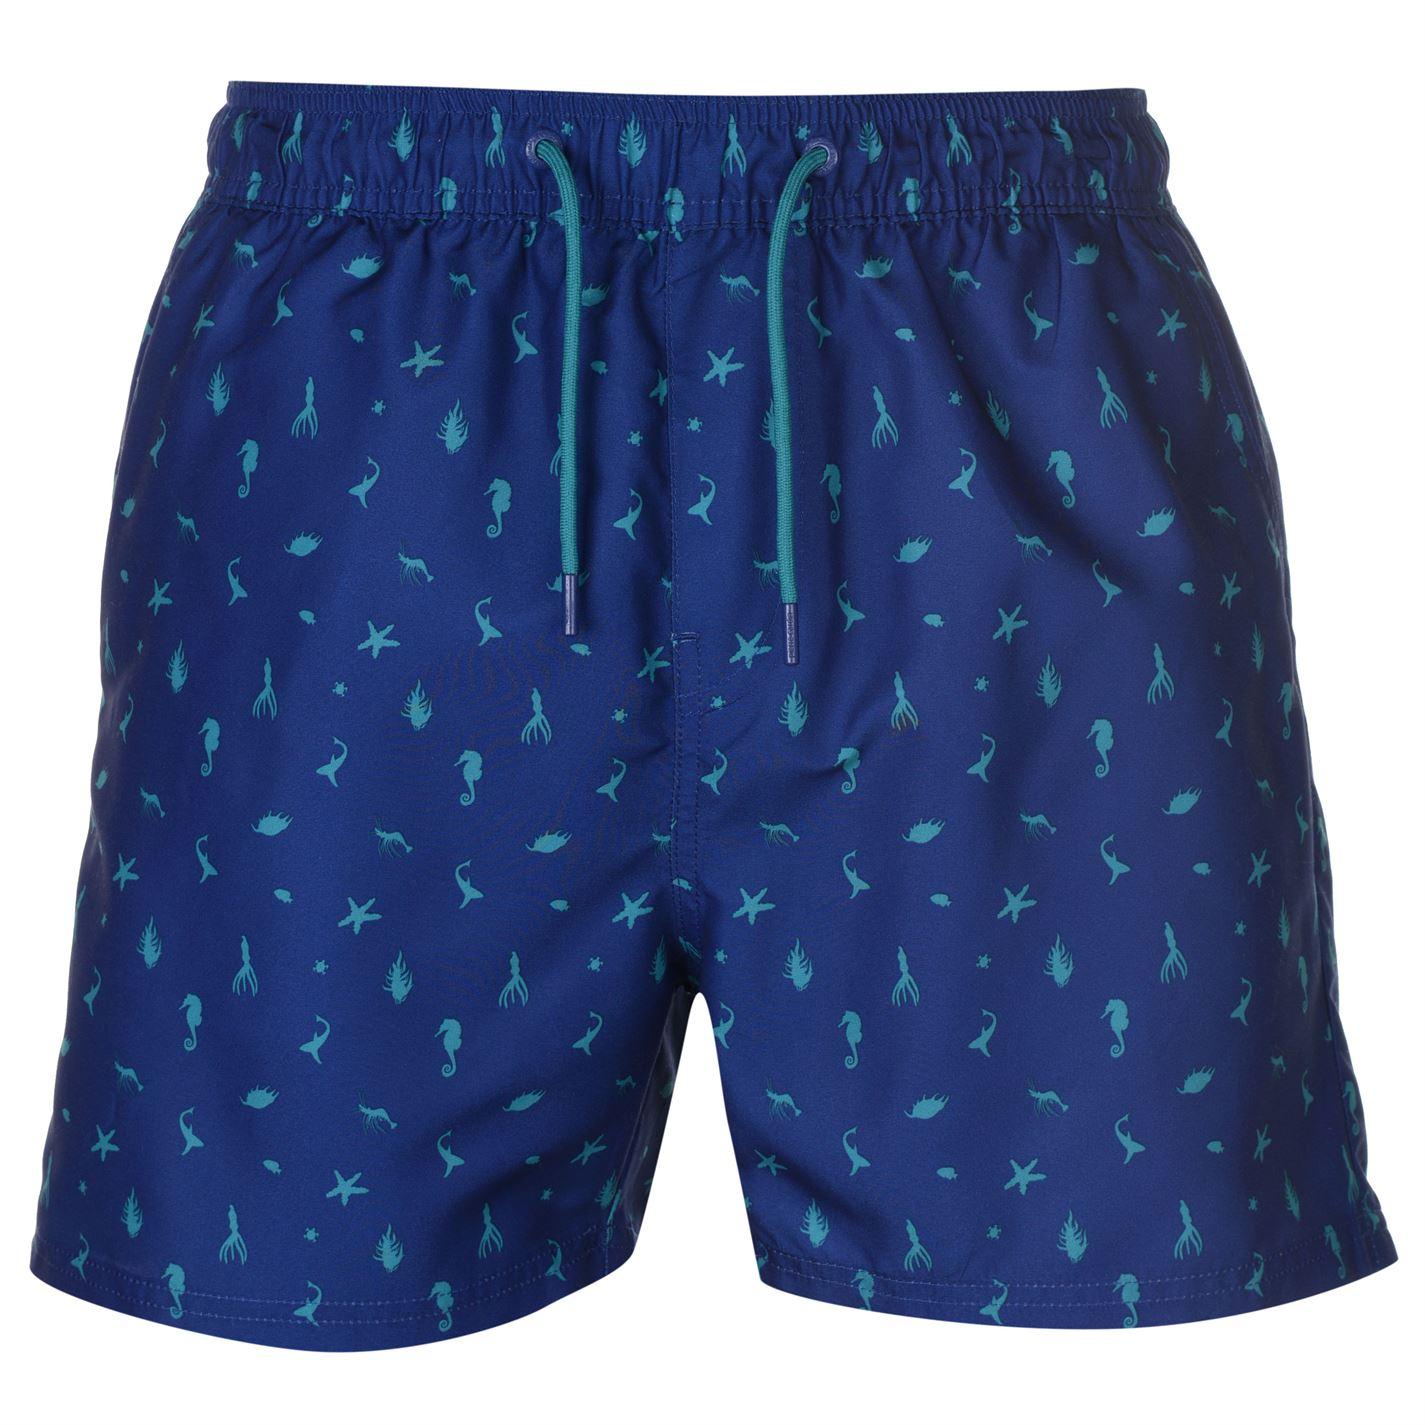 Pierre Cardin Sea AOP Swim Shorts Mens